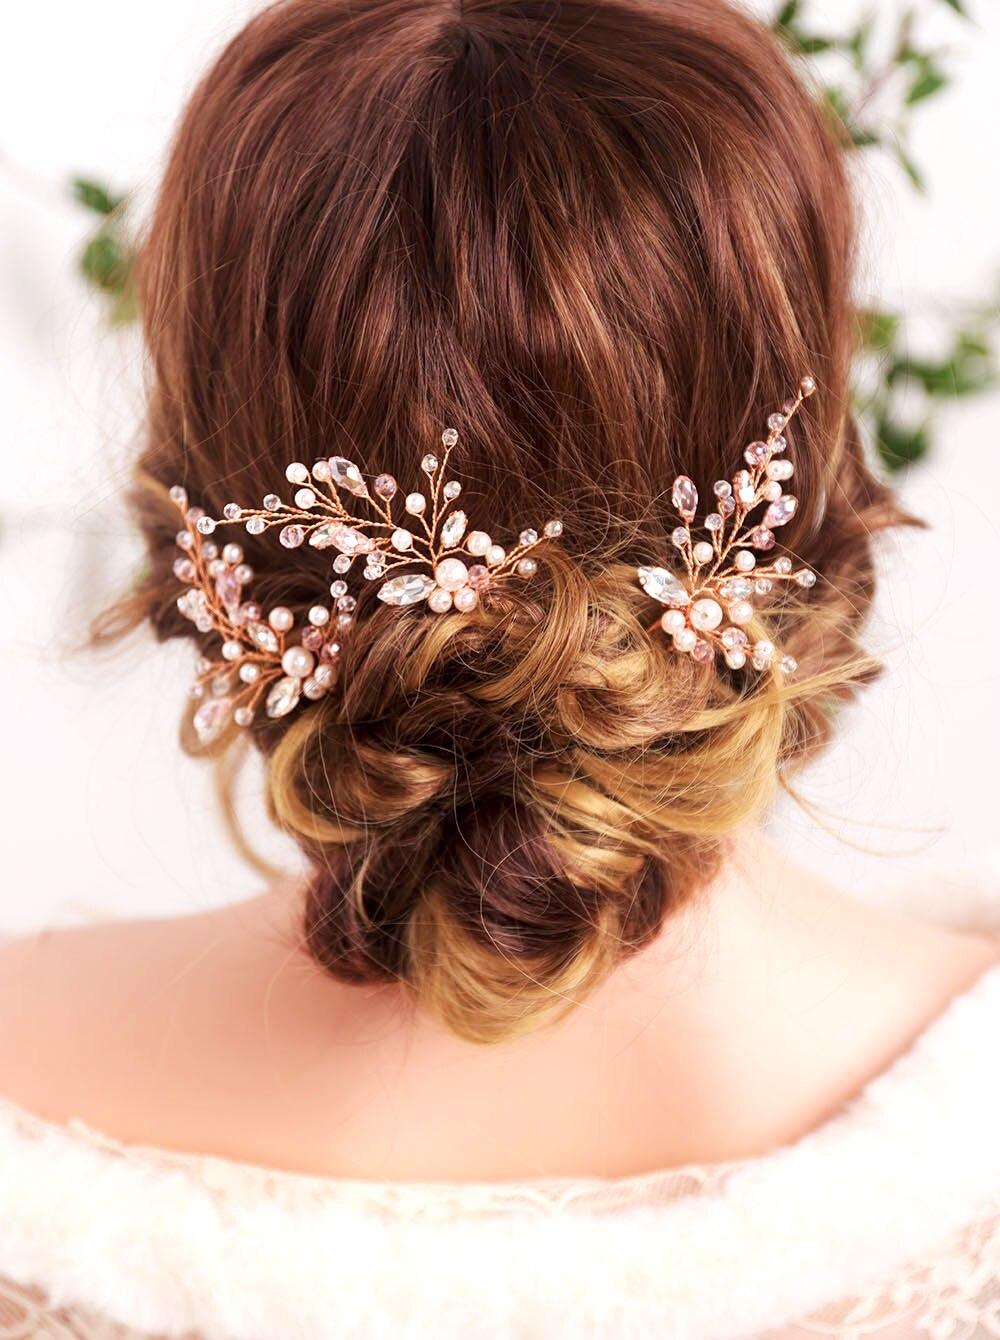 Handmade Cloth Chiffon Ivory wedding headdress flowers with beads artificial crystal balls Peals for bridal and bridesmaid wedding headwear